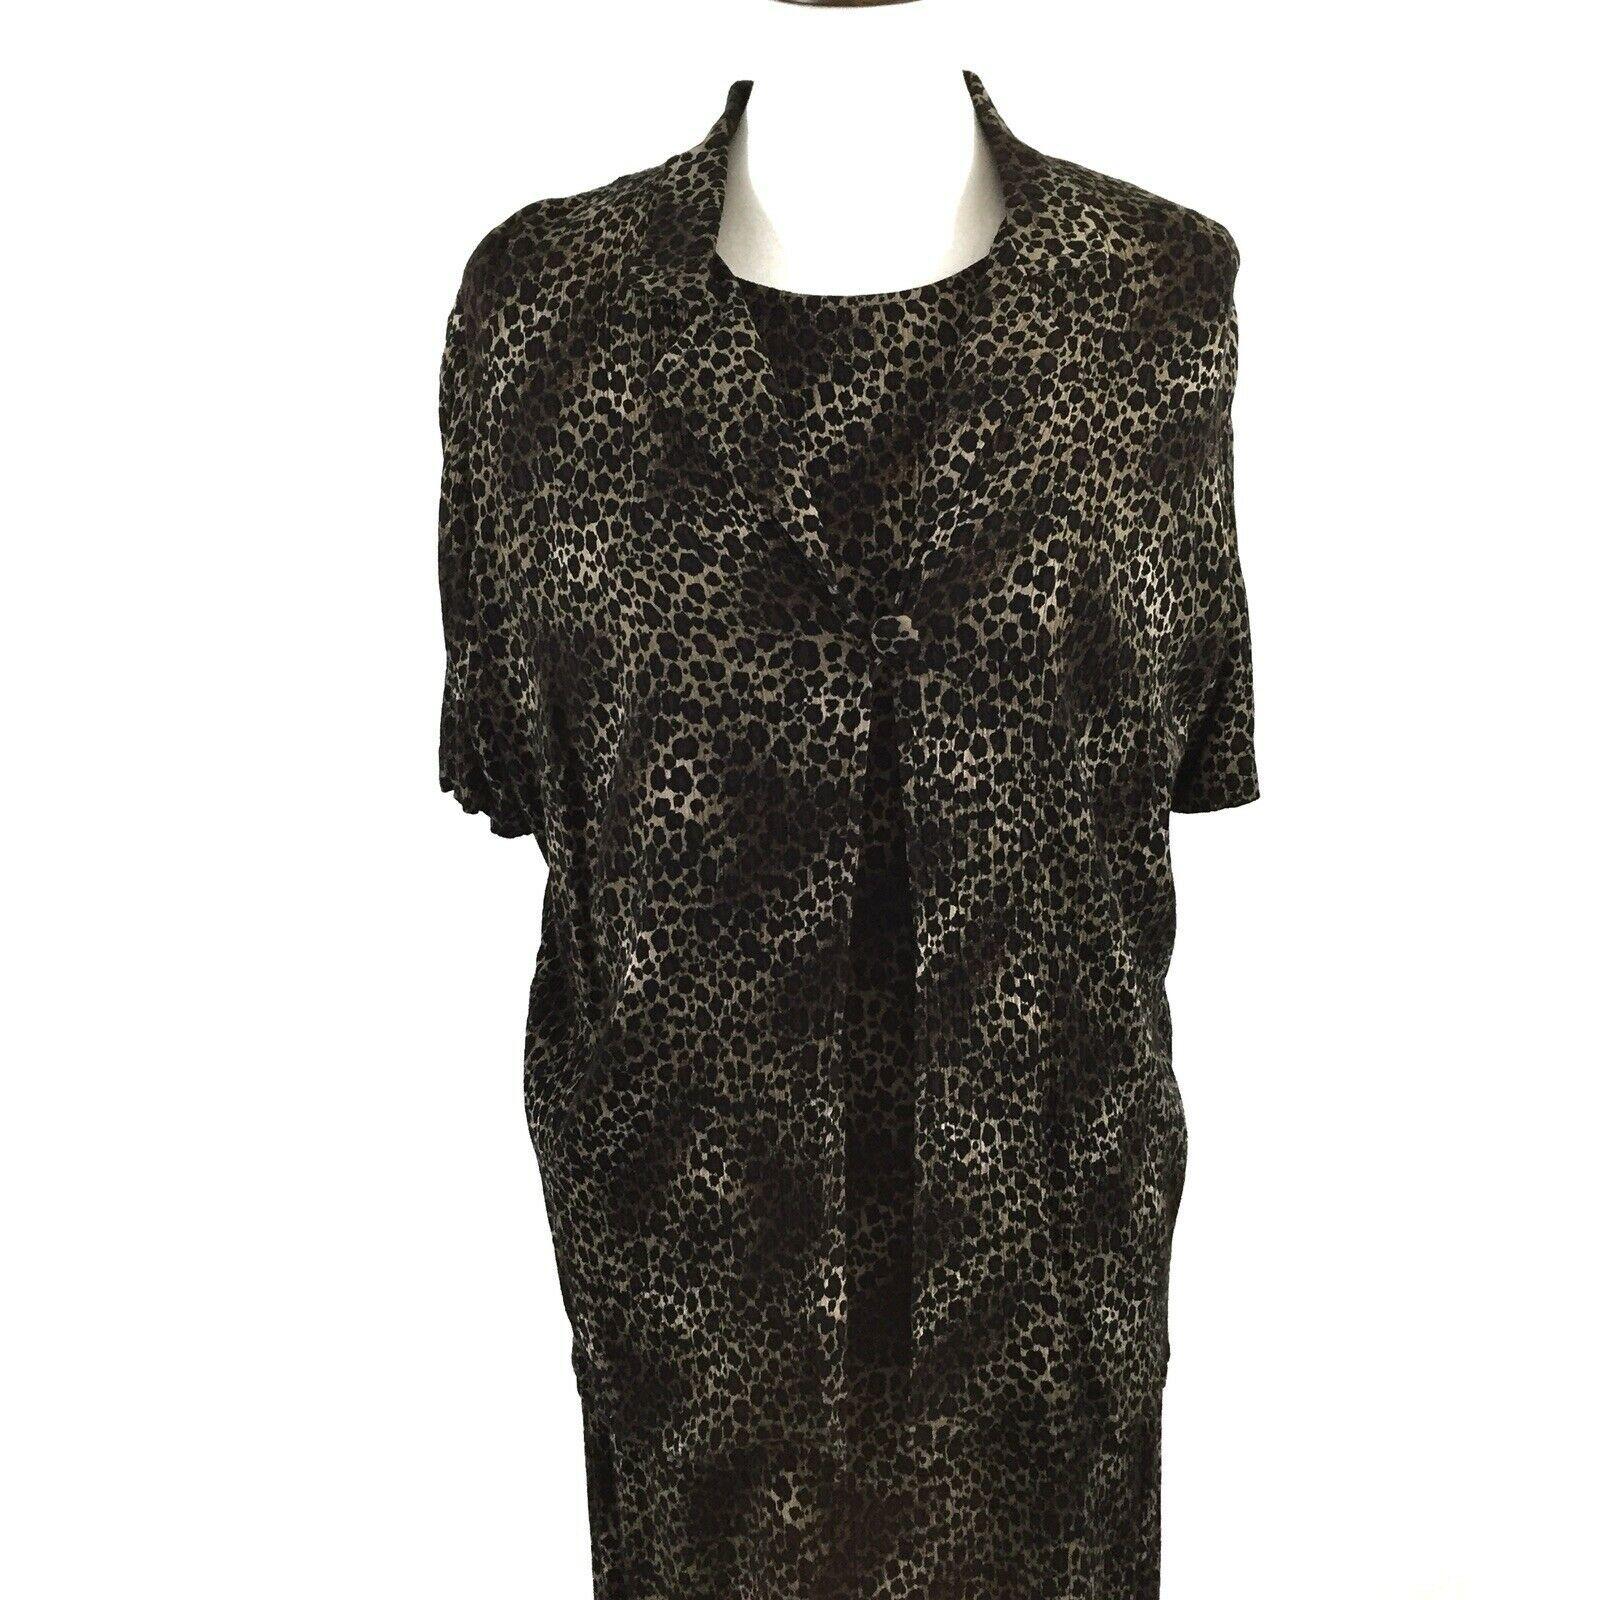 KSL Karin Stevens Sleeveless Maxi Dress and Jacket Size 14W Brown Animal Print image 2